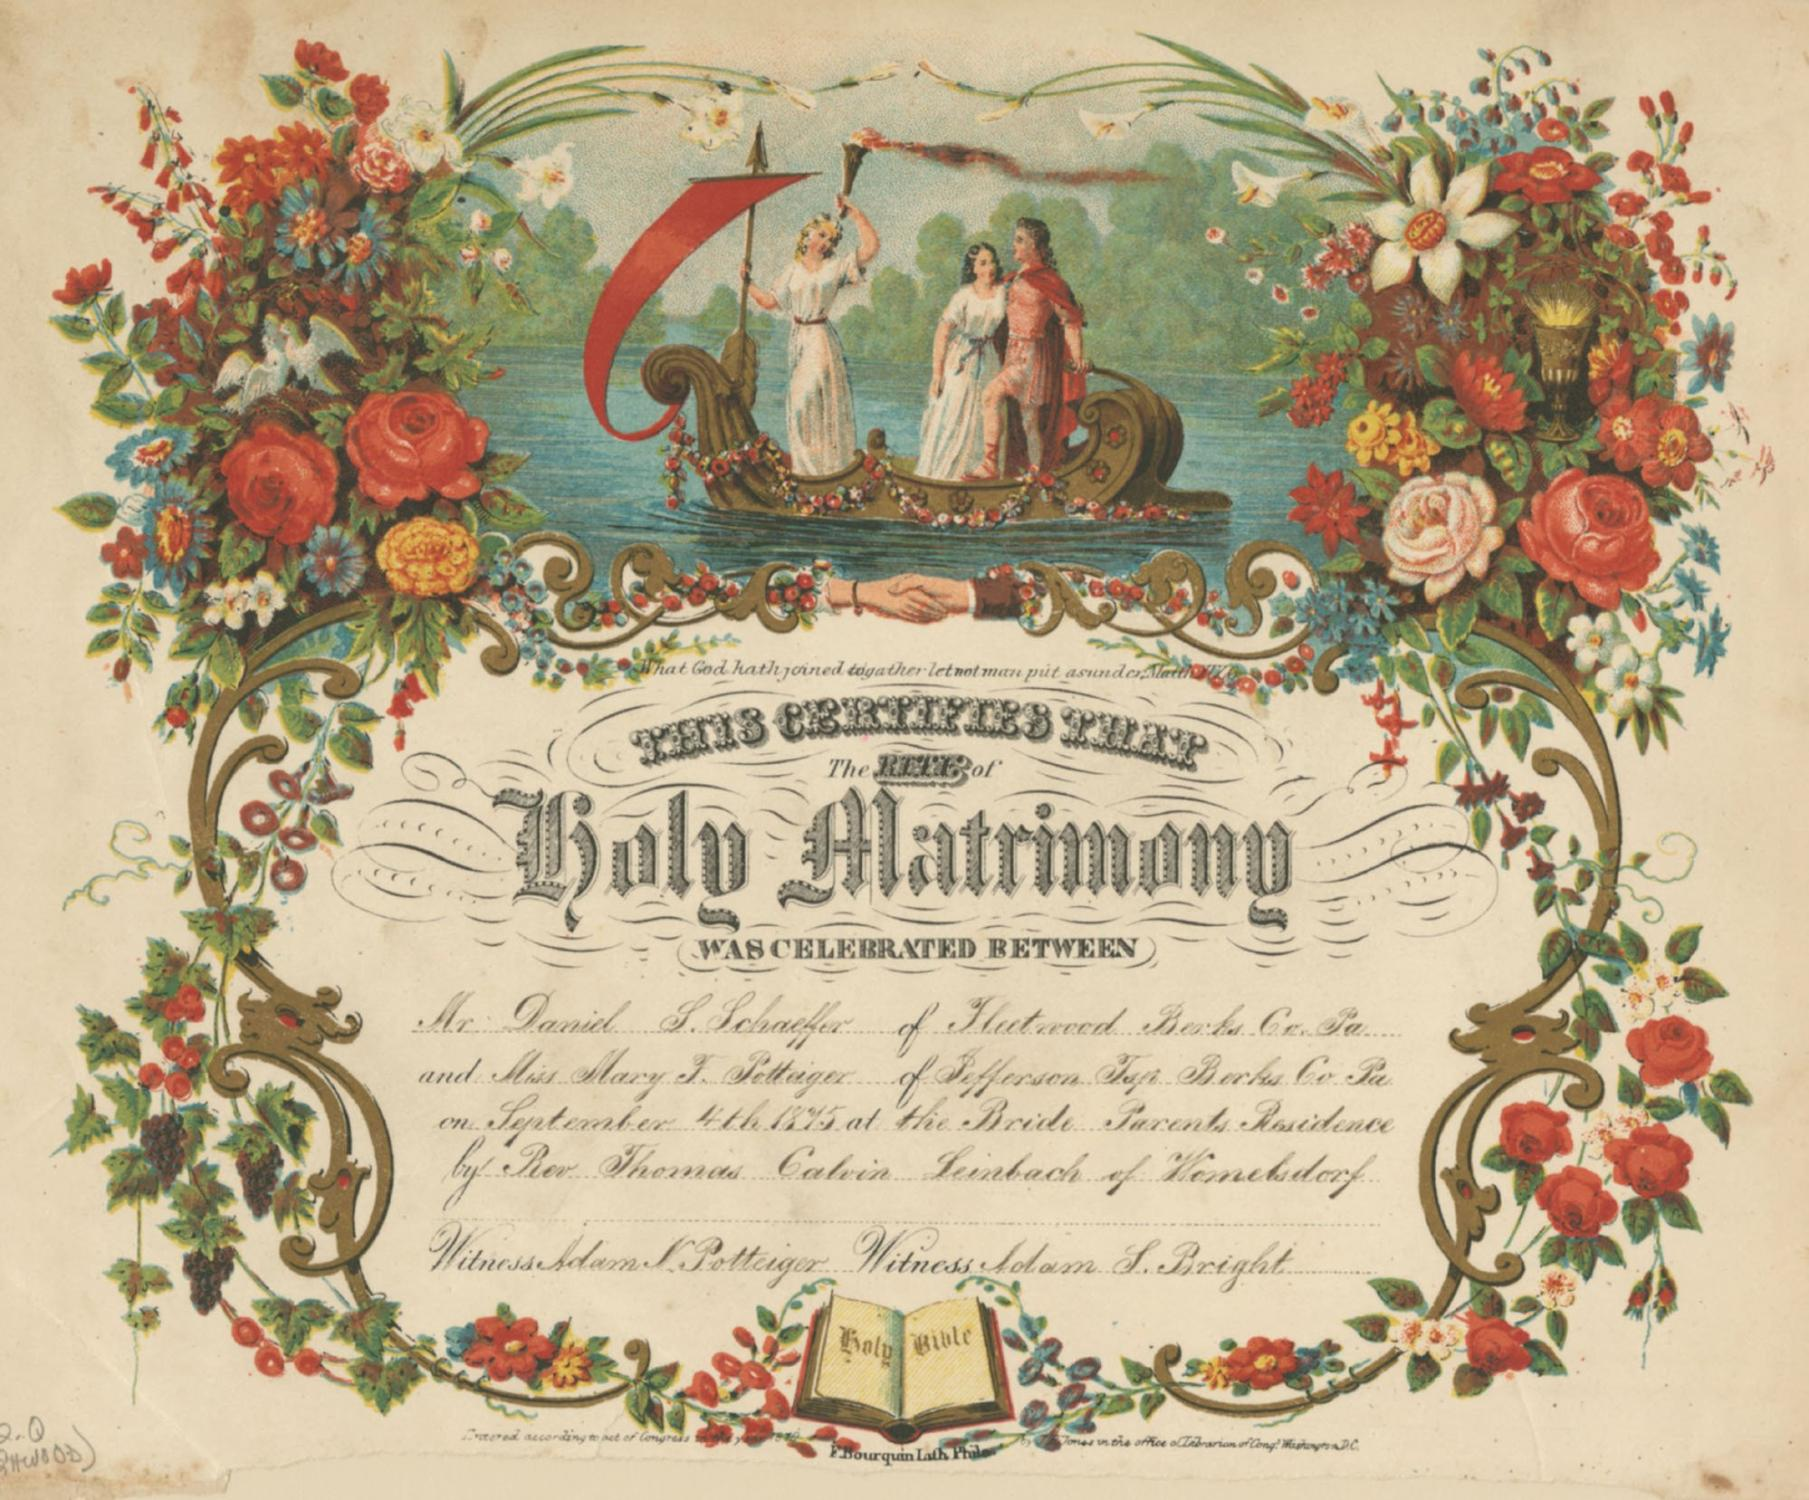 Illuminated Wedding Certificate